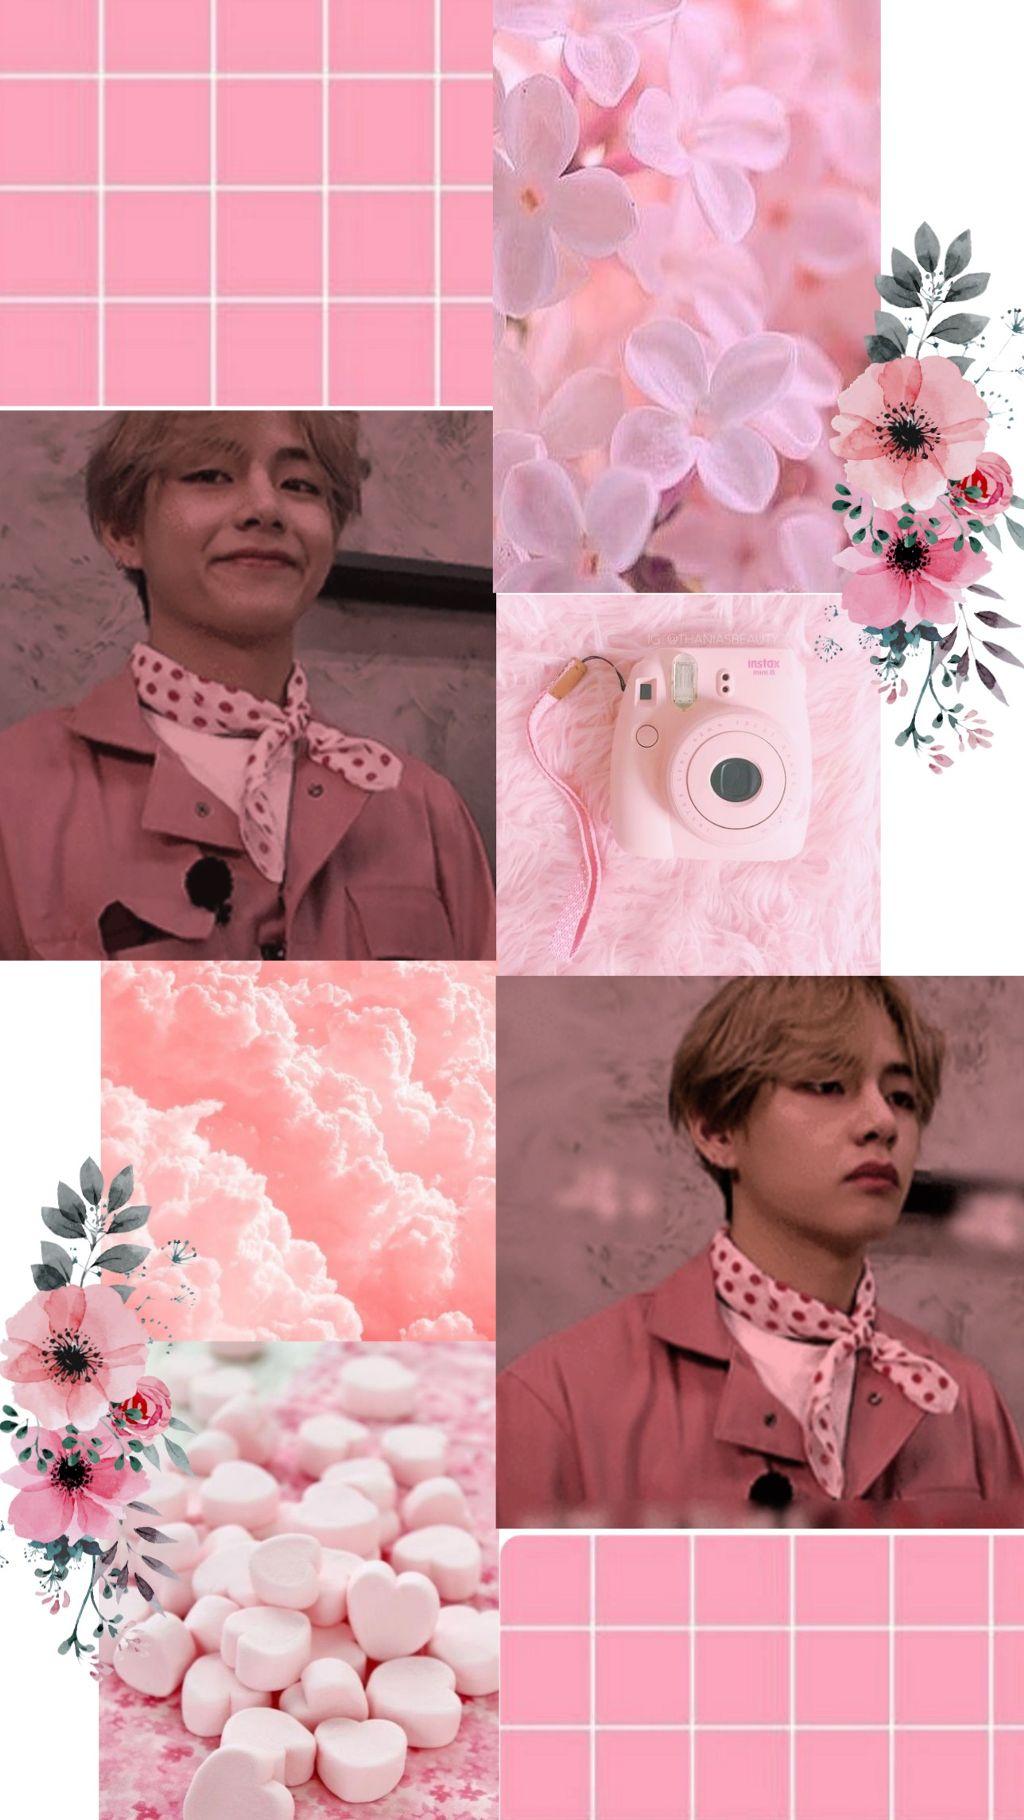 DONTEDIT V kimtaehyung bts pink cute wallpaper BTS MINE